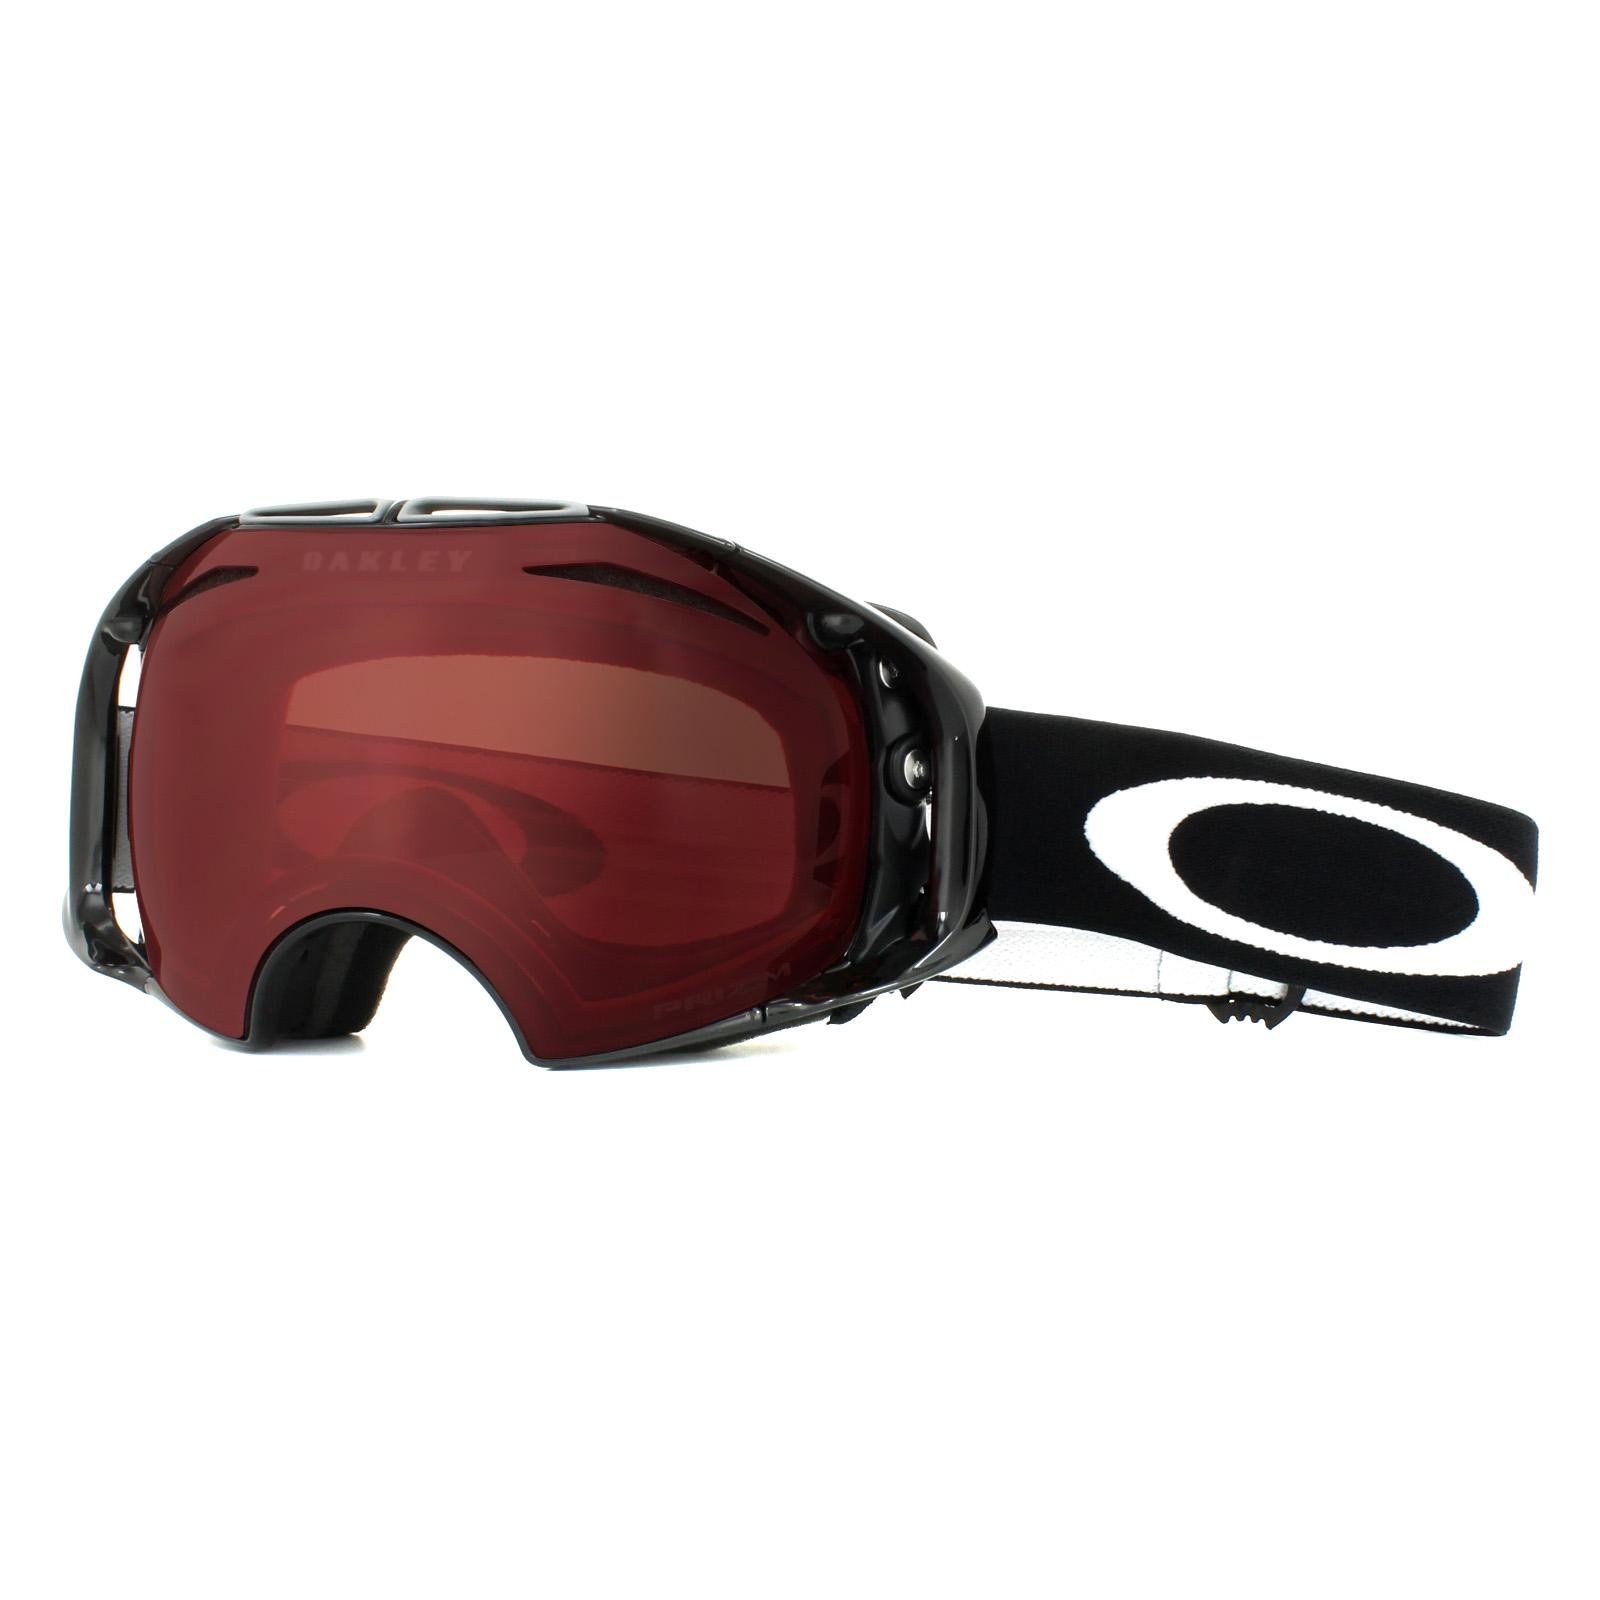 b0720f70b3c Details about Oakley Ski Goggles Airbrake OO7037-42 Jet Black Prizm Rose    Dark Grey